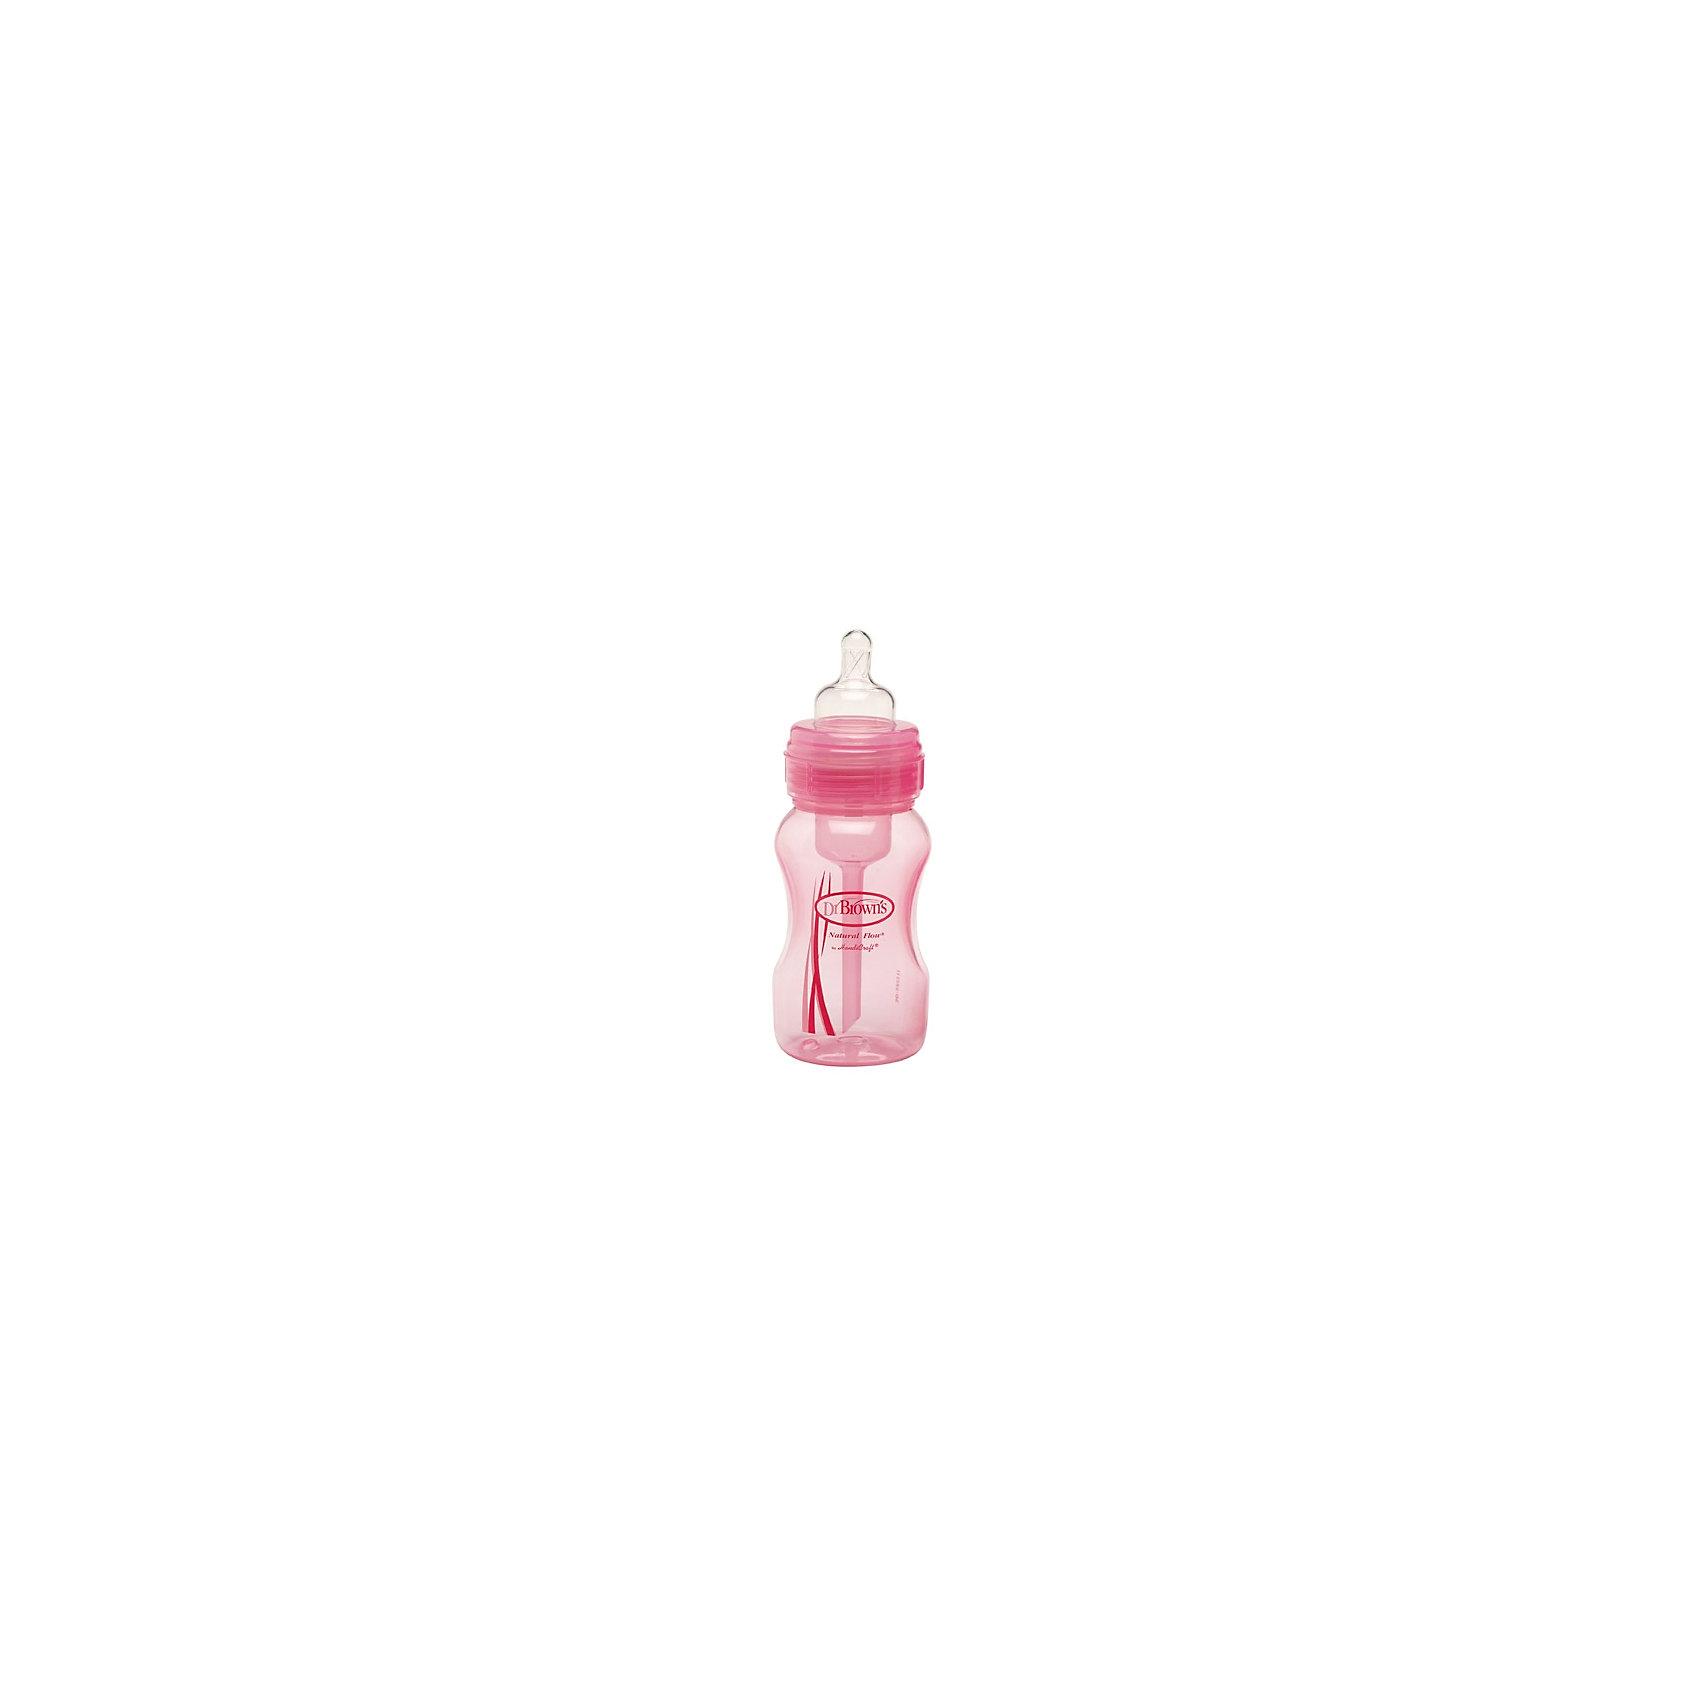 Dr.Brown's Бутылочка с широким горлышком 240 мл, полипропилен, Dr. Brown, розовый dr brown бутылочка стандартная 120 мл полипропилен 155